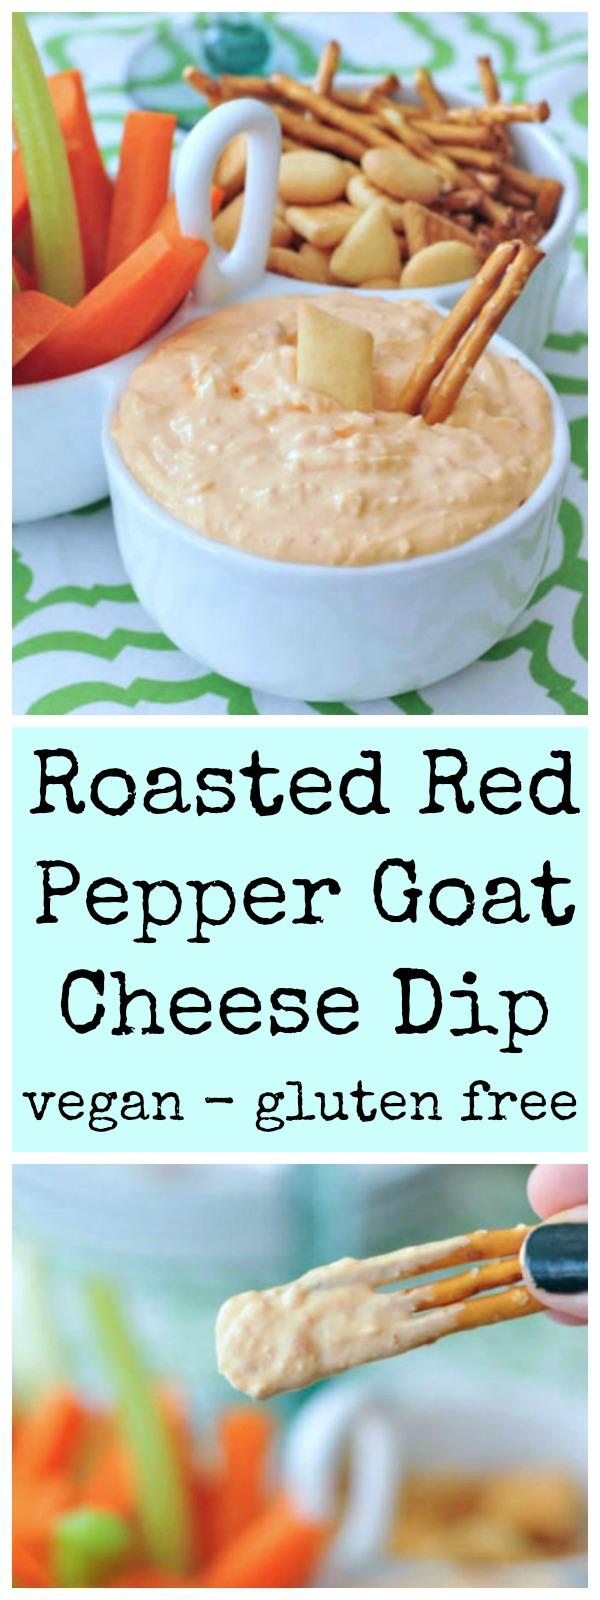 Roasted Red Pepper Goat Cheese Dip @spabettie #vegan #glutenfree